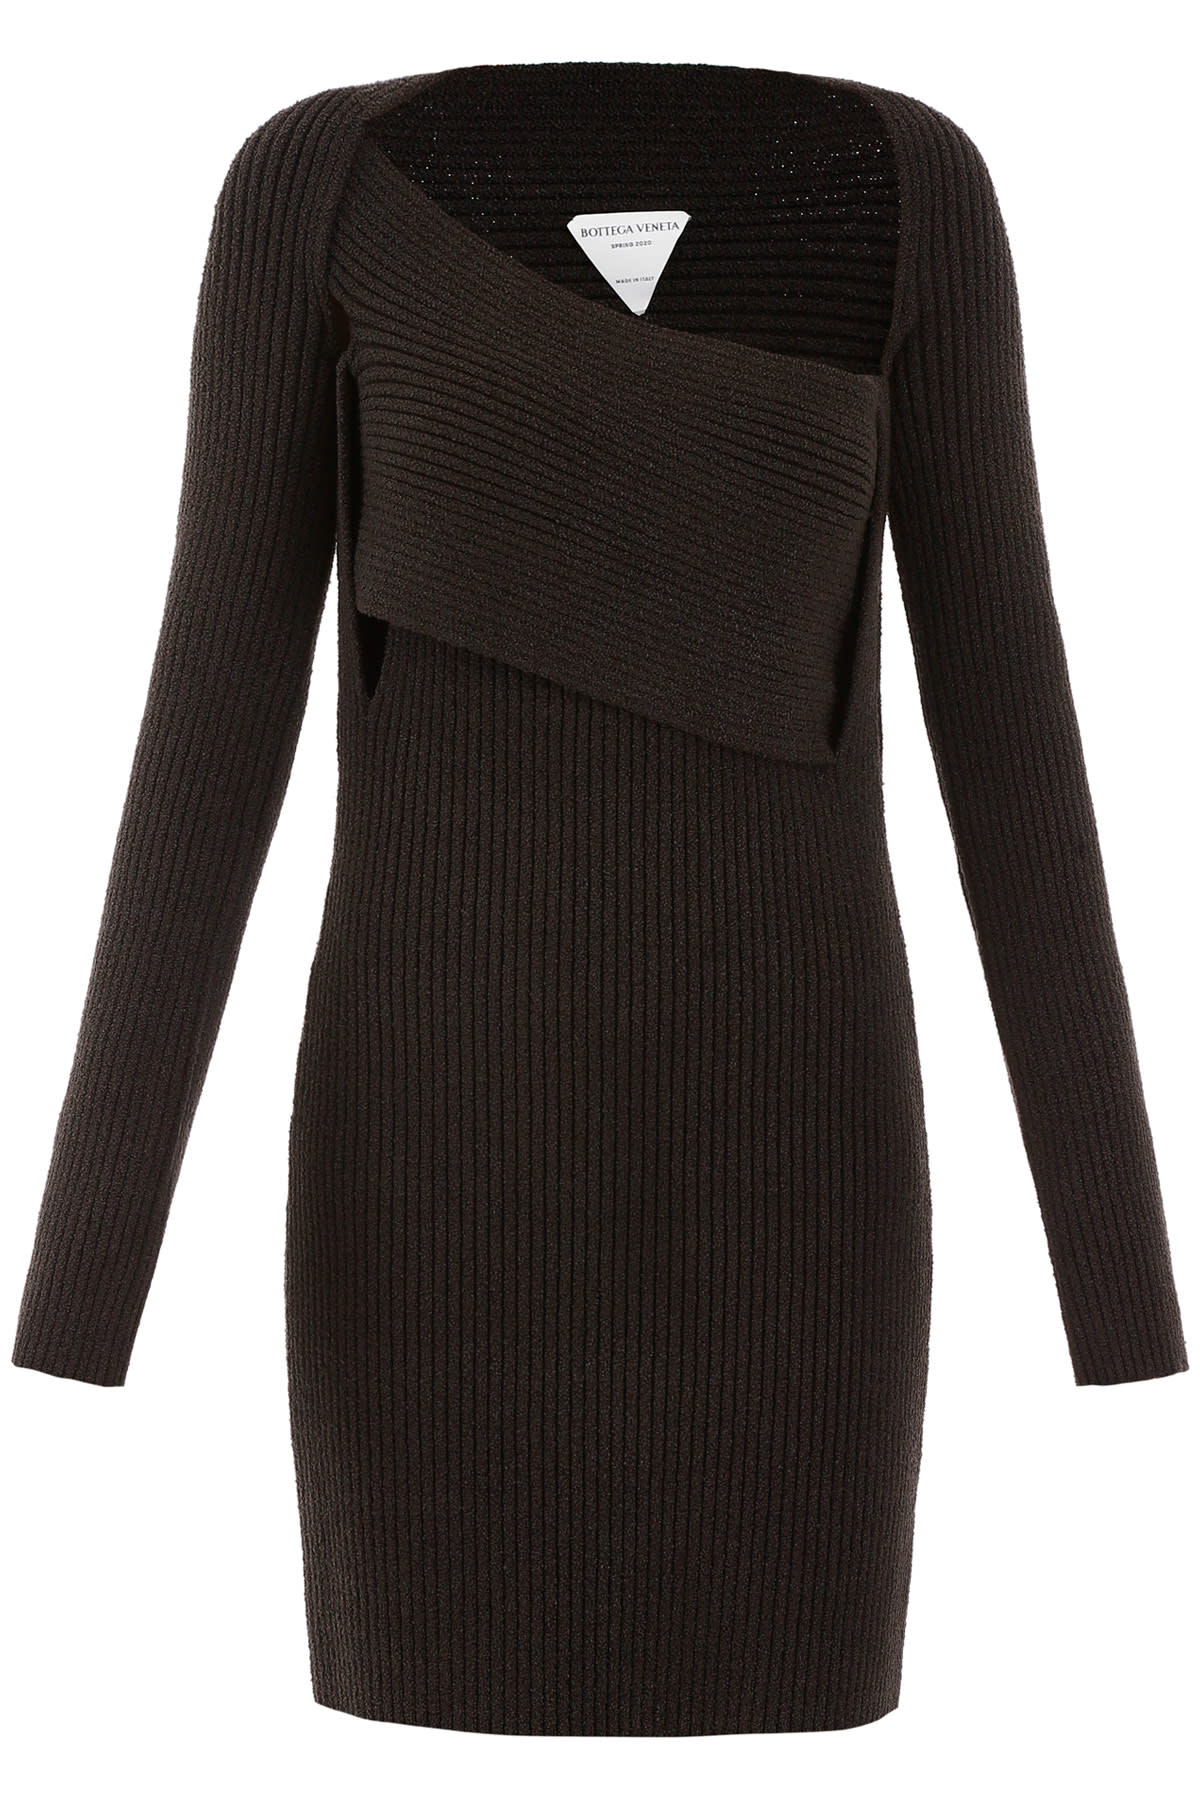 Buy Bottega Veneta Ribbed Knit Dress online, shop Bottega Veneta with free shipping